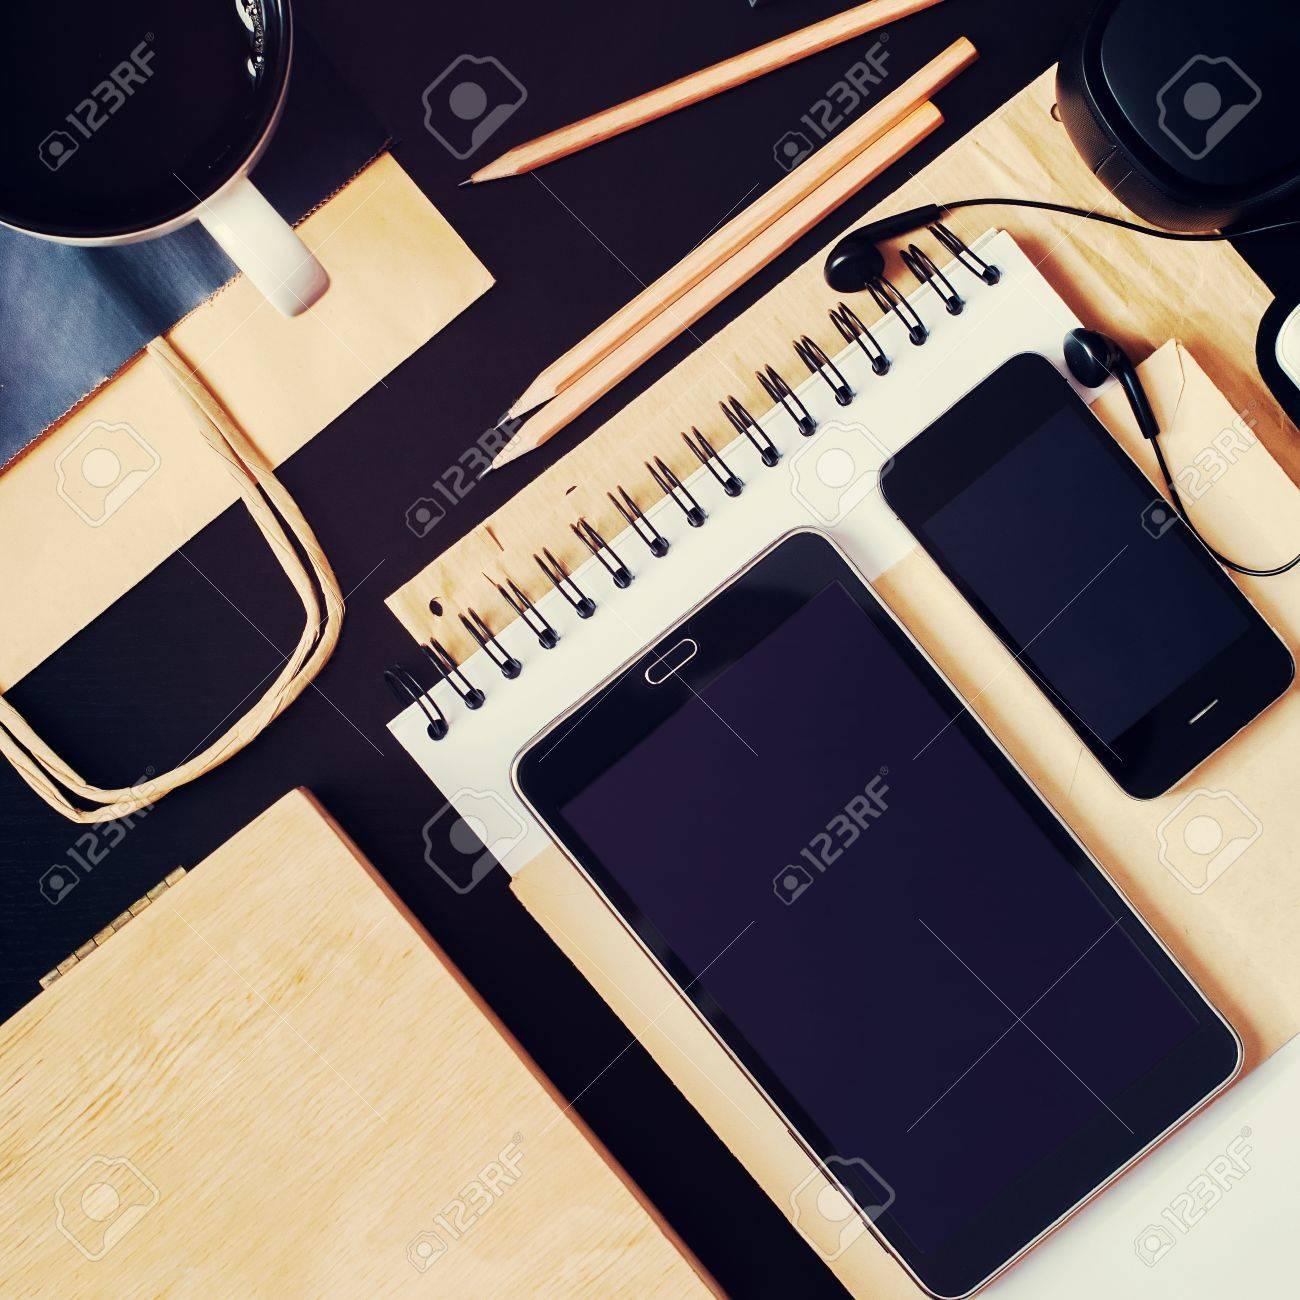 Genial Set Business Men Order On Black Office Table. Modern Devices Accessories  Phone Tablet Earphones.